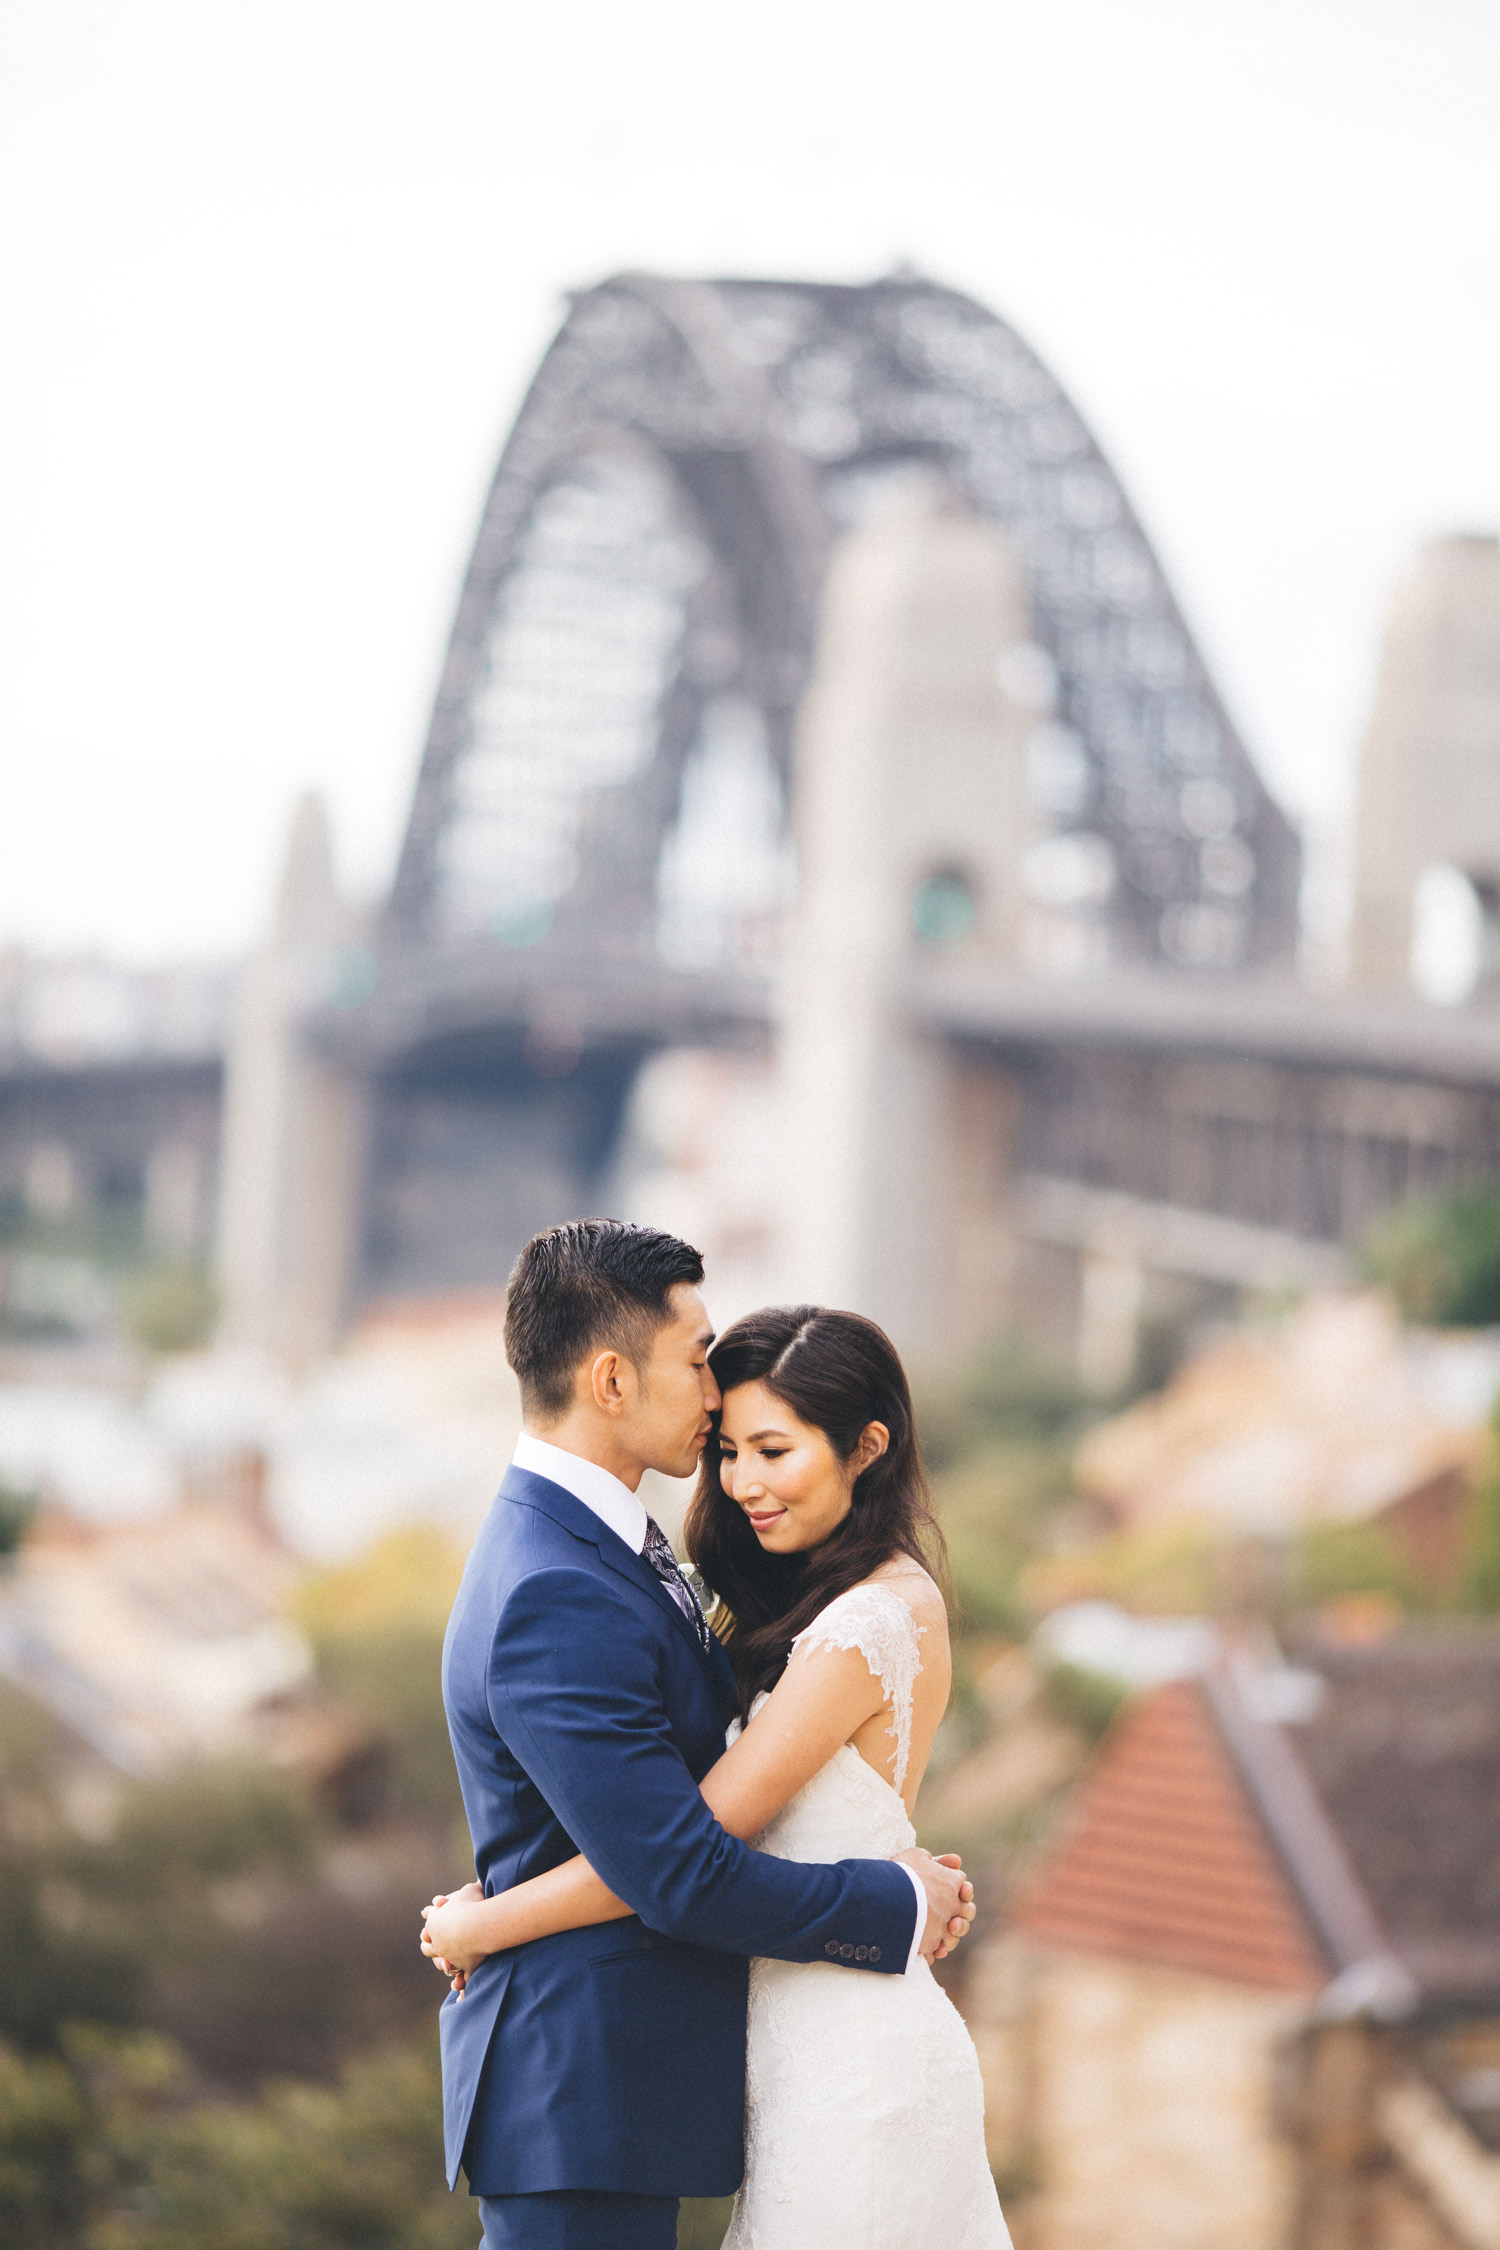 Phuong-Chris-Wedding-080.jpg